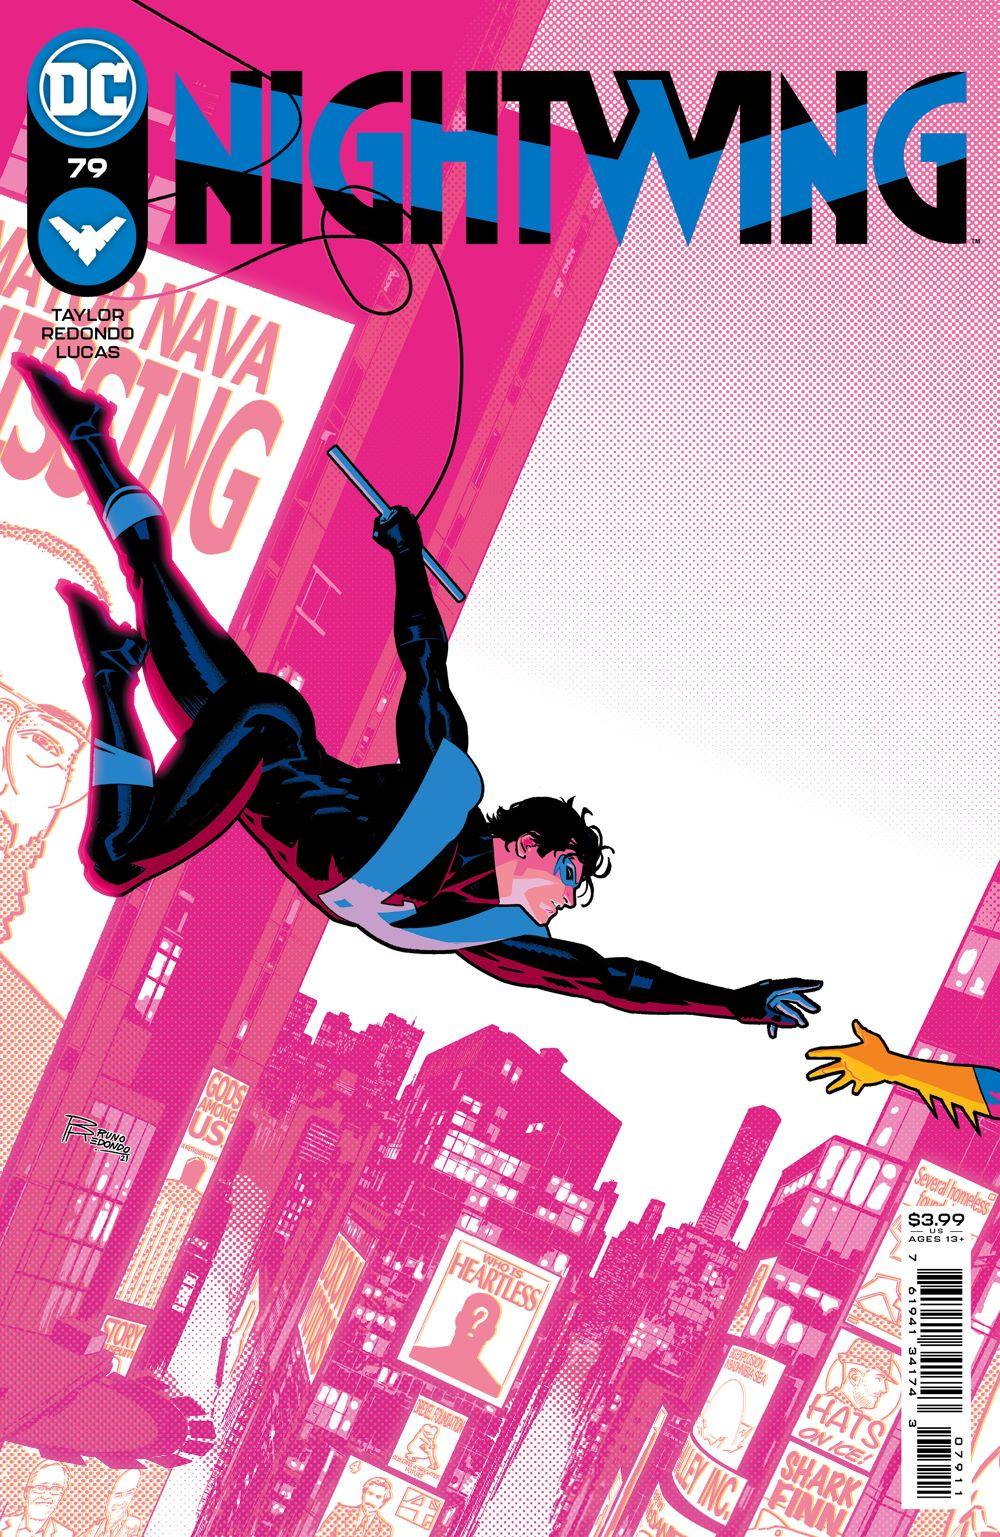 NIGHTWING_Cv79 DC Comics April 2021 Solicitations